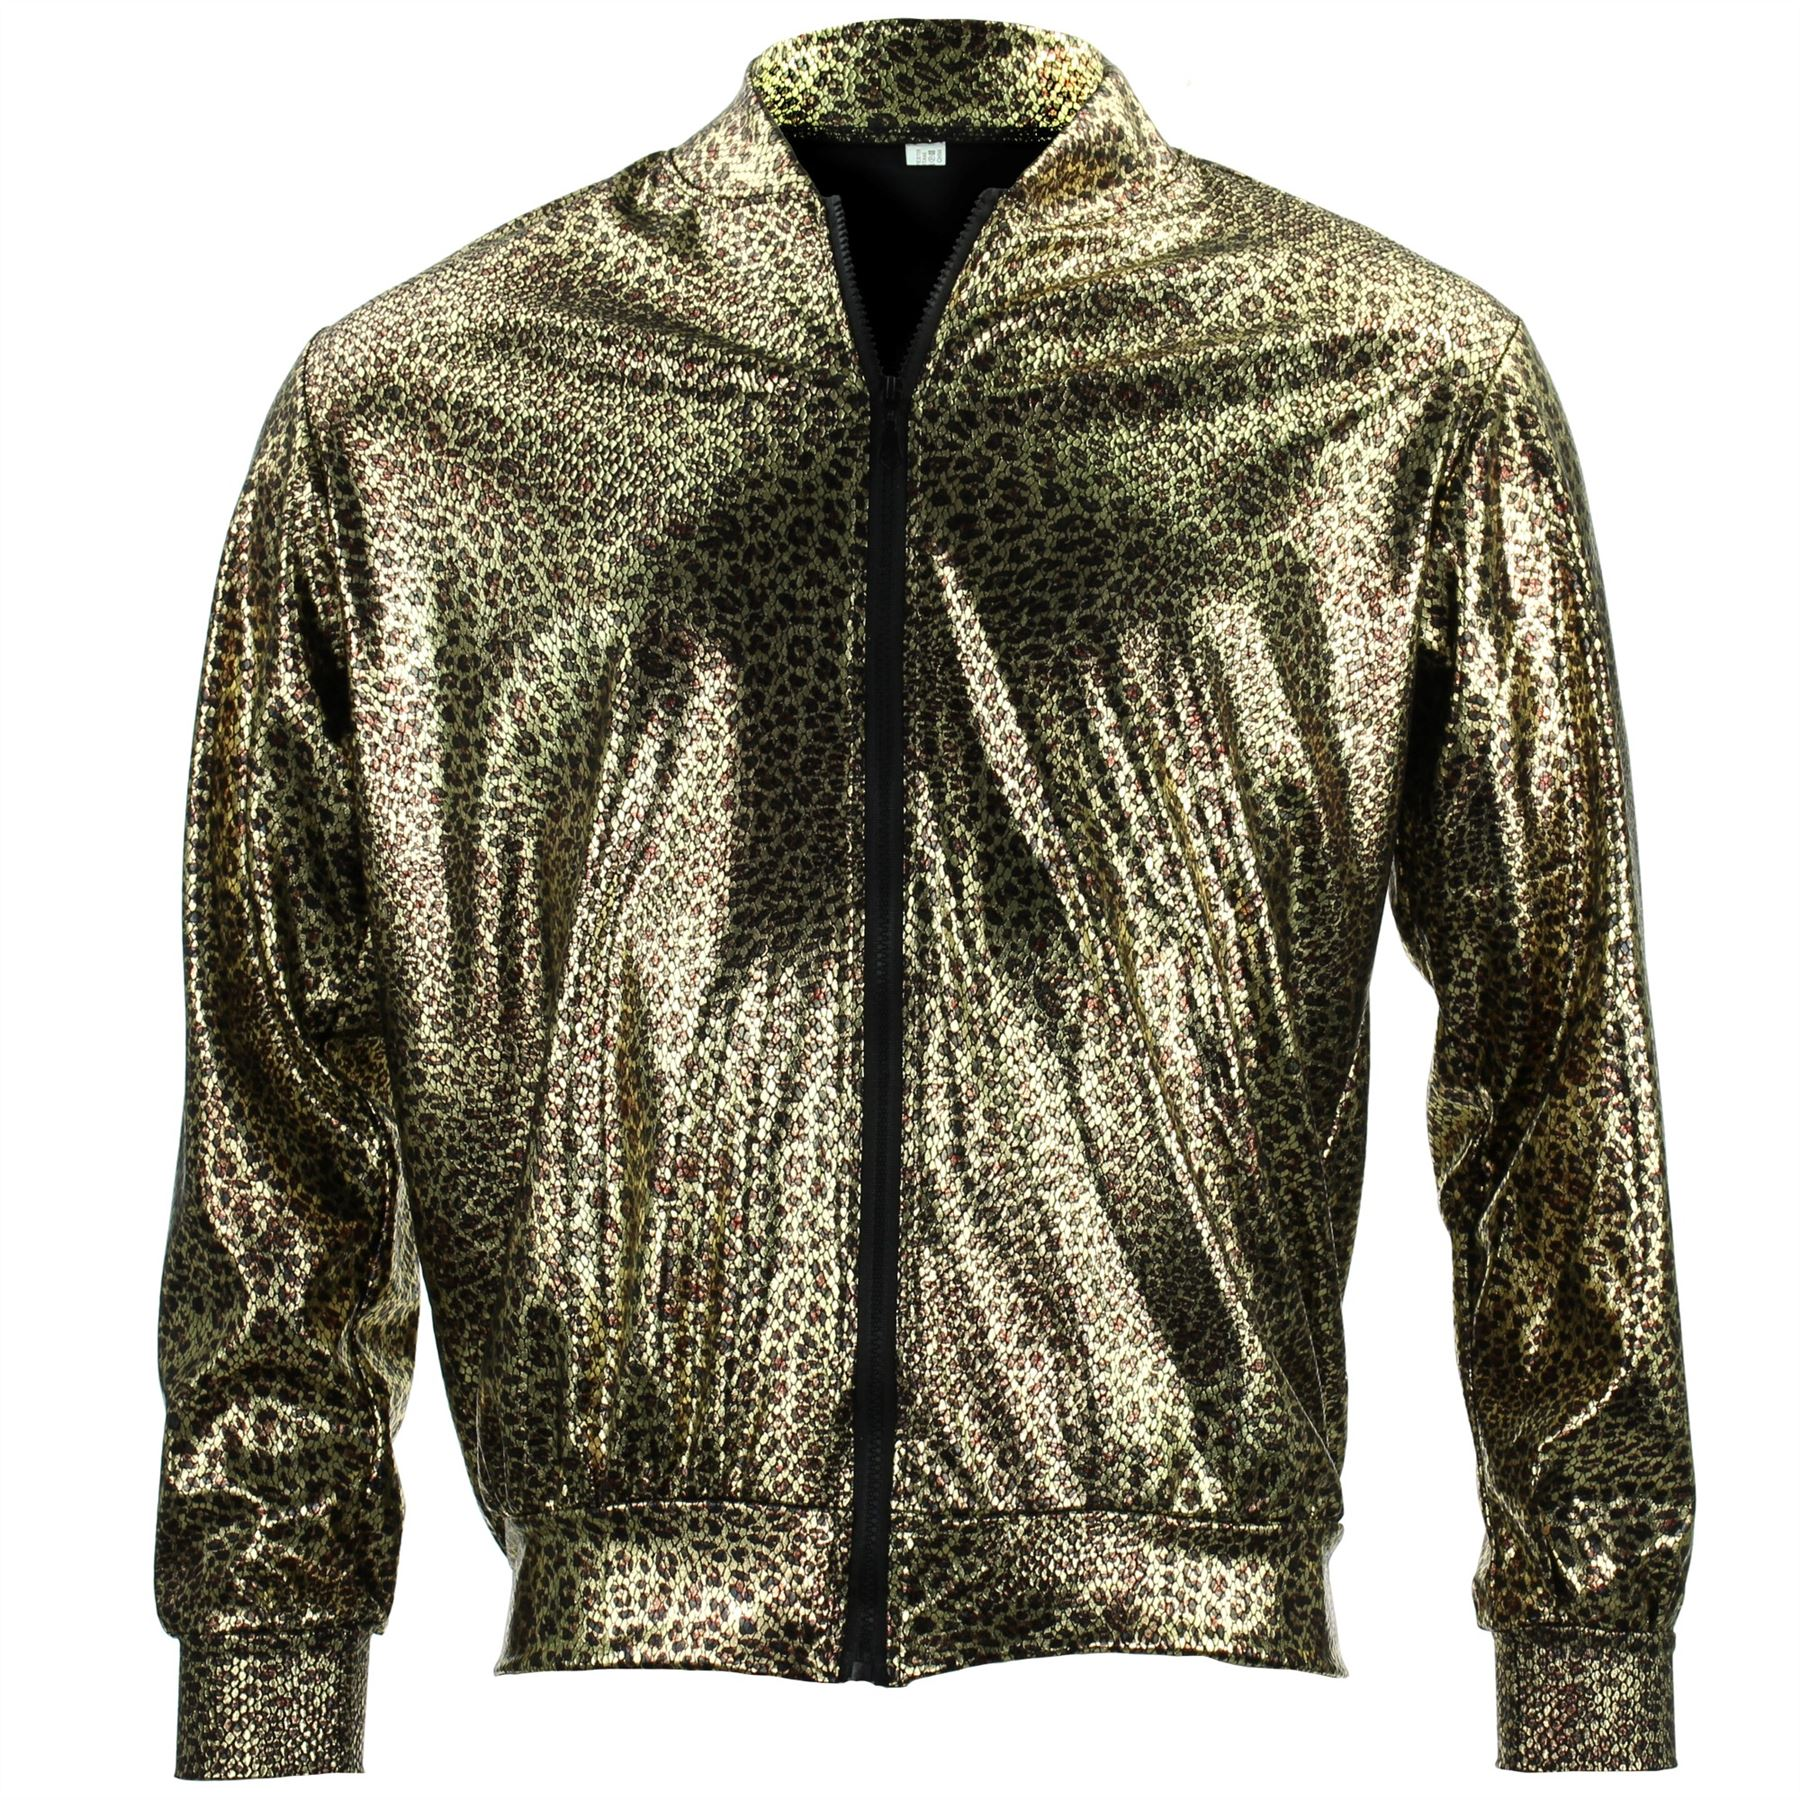 Bomber-Jacket-Shiny-Unisex-Ladies-Men-FIREFLY-Sparkly-GOLD-SILVER-RAINBOW-PURPLE thumbnail 19